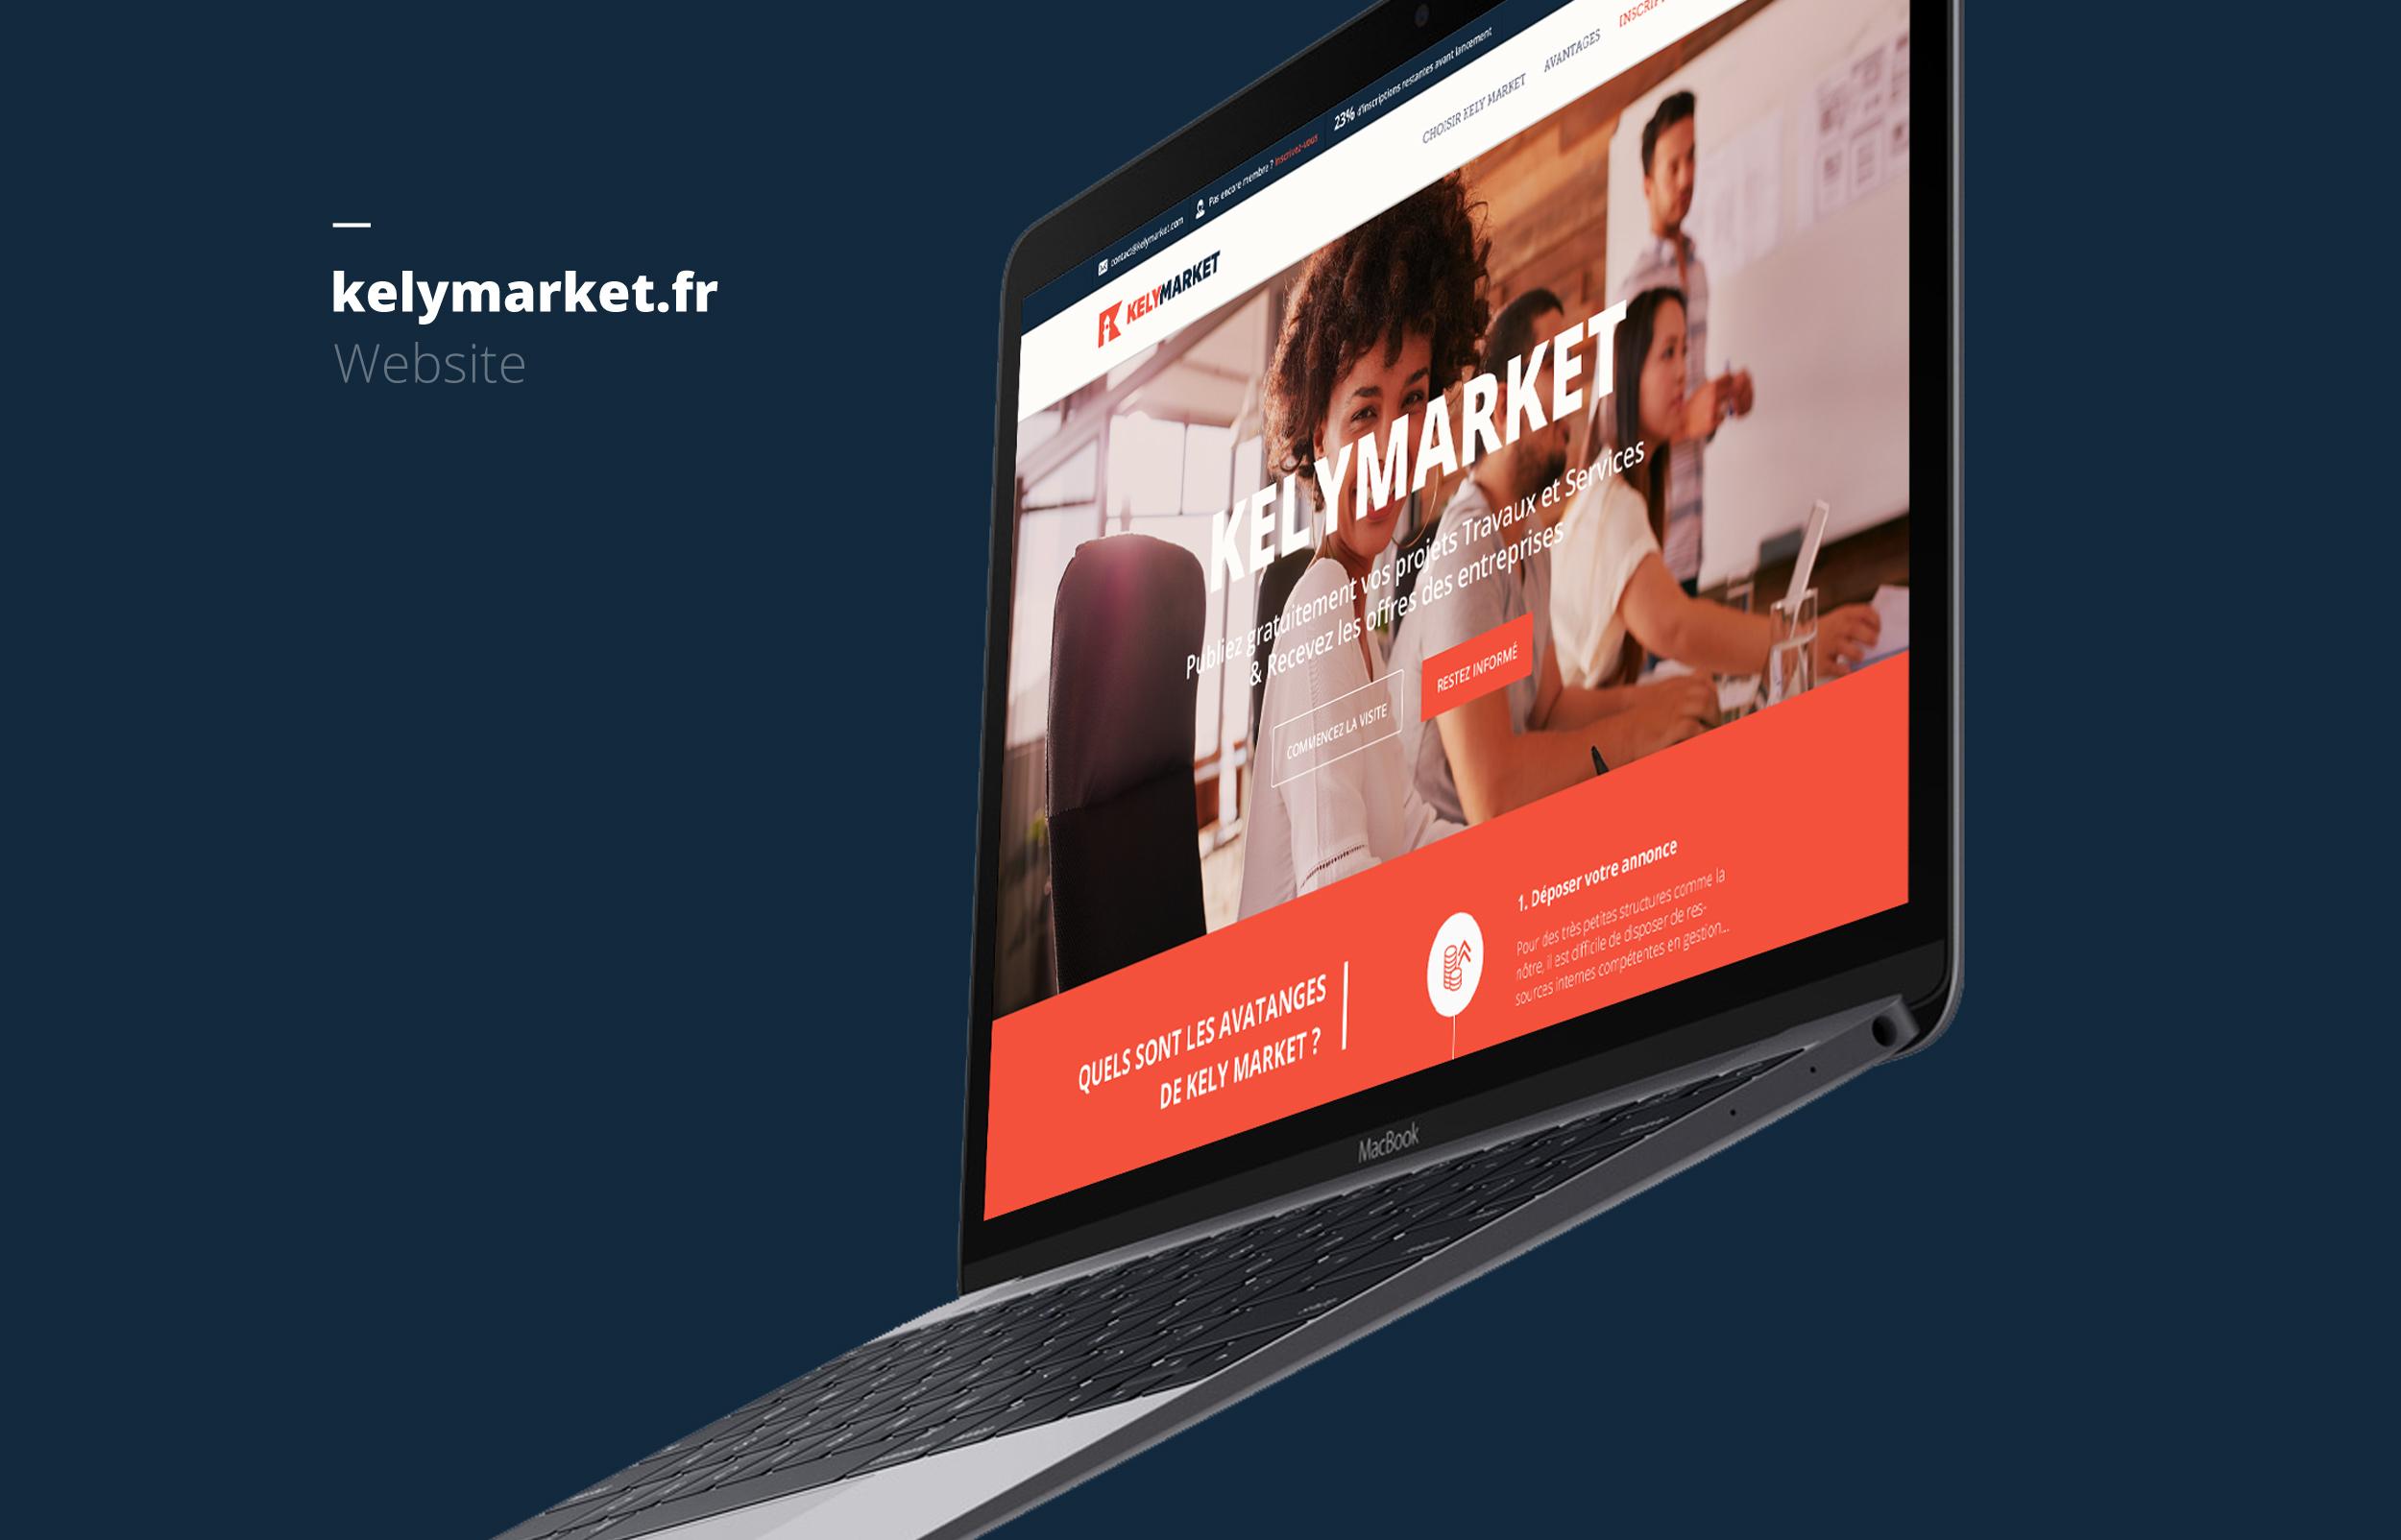 Kely Market - Market Place - millimade